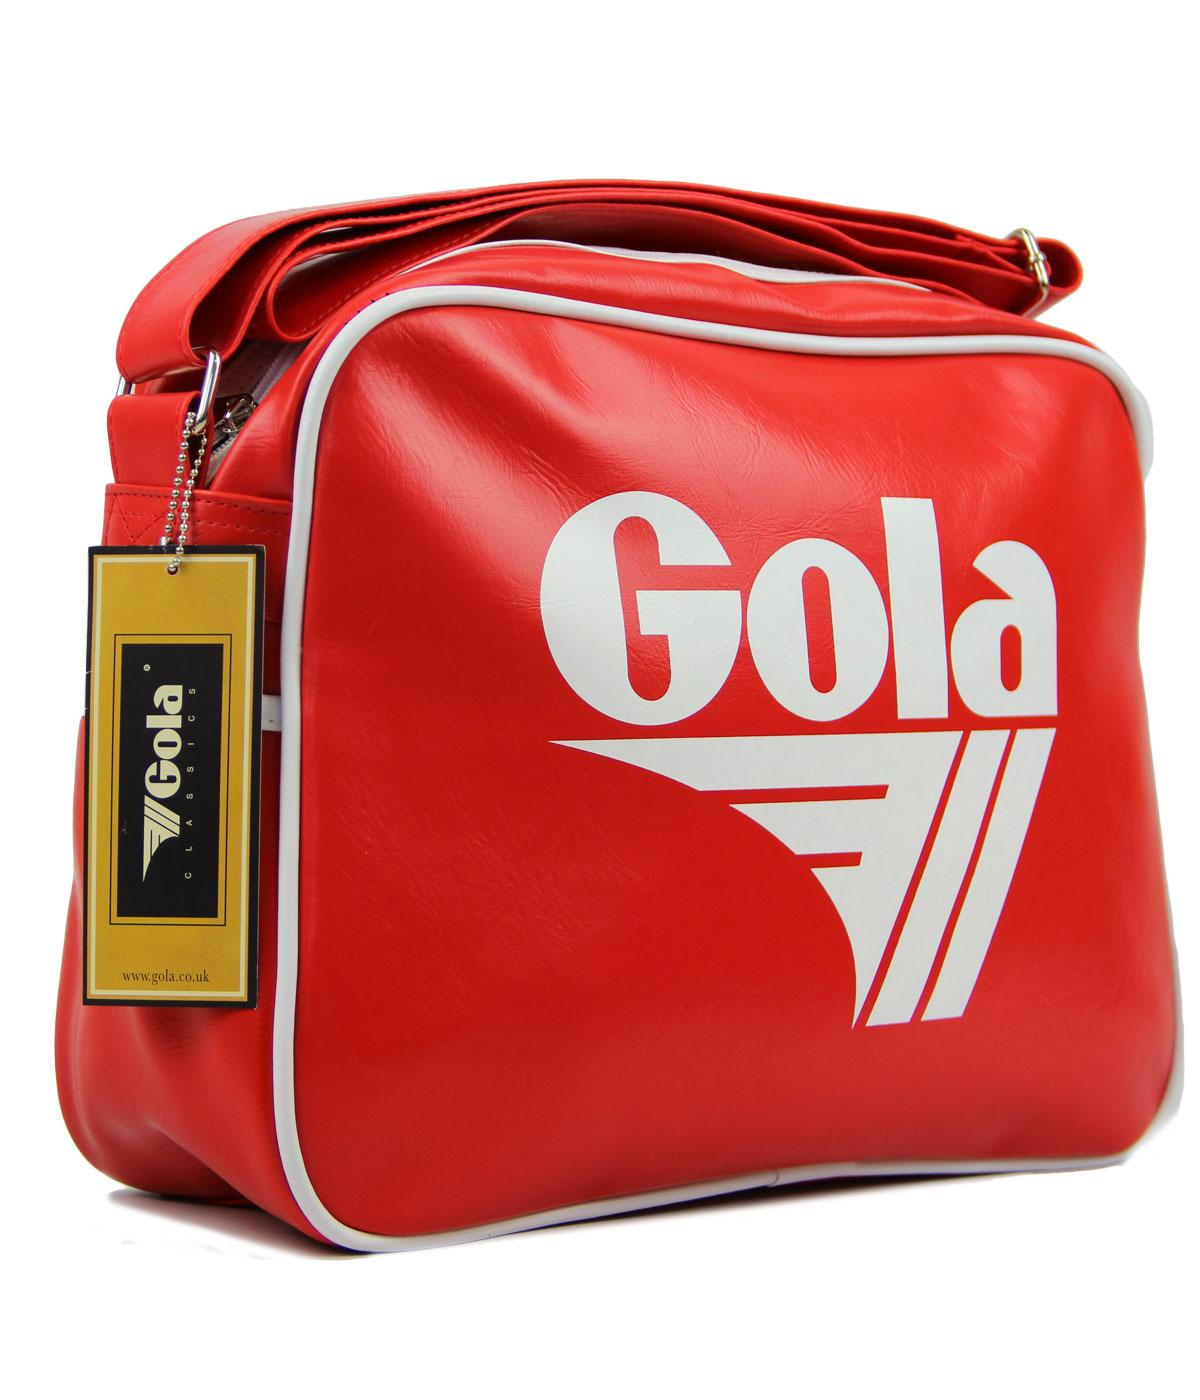 GOLA Redford Retro 70s Sports Shoulder Bag RED/WHT